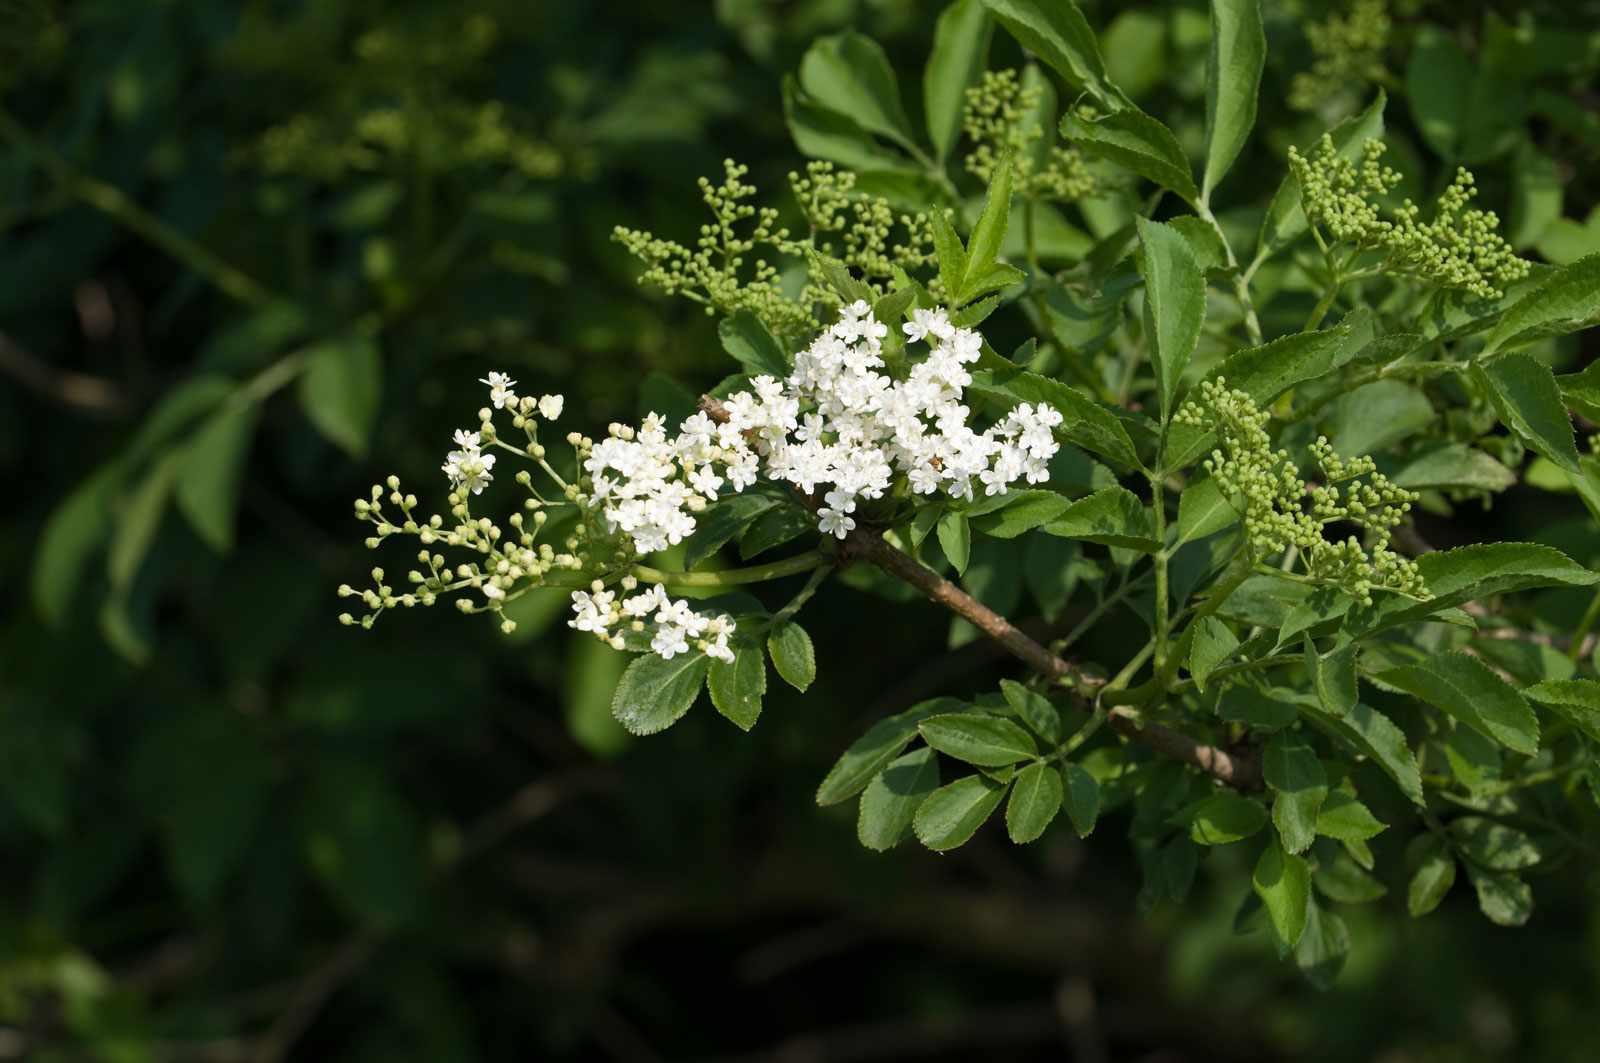 Elderflowertree-e0efdb7